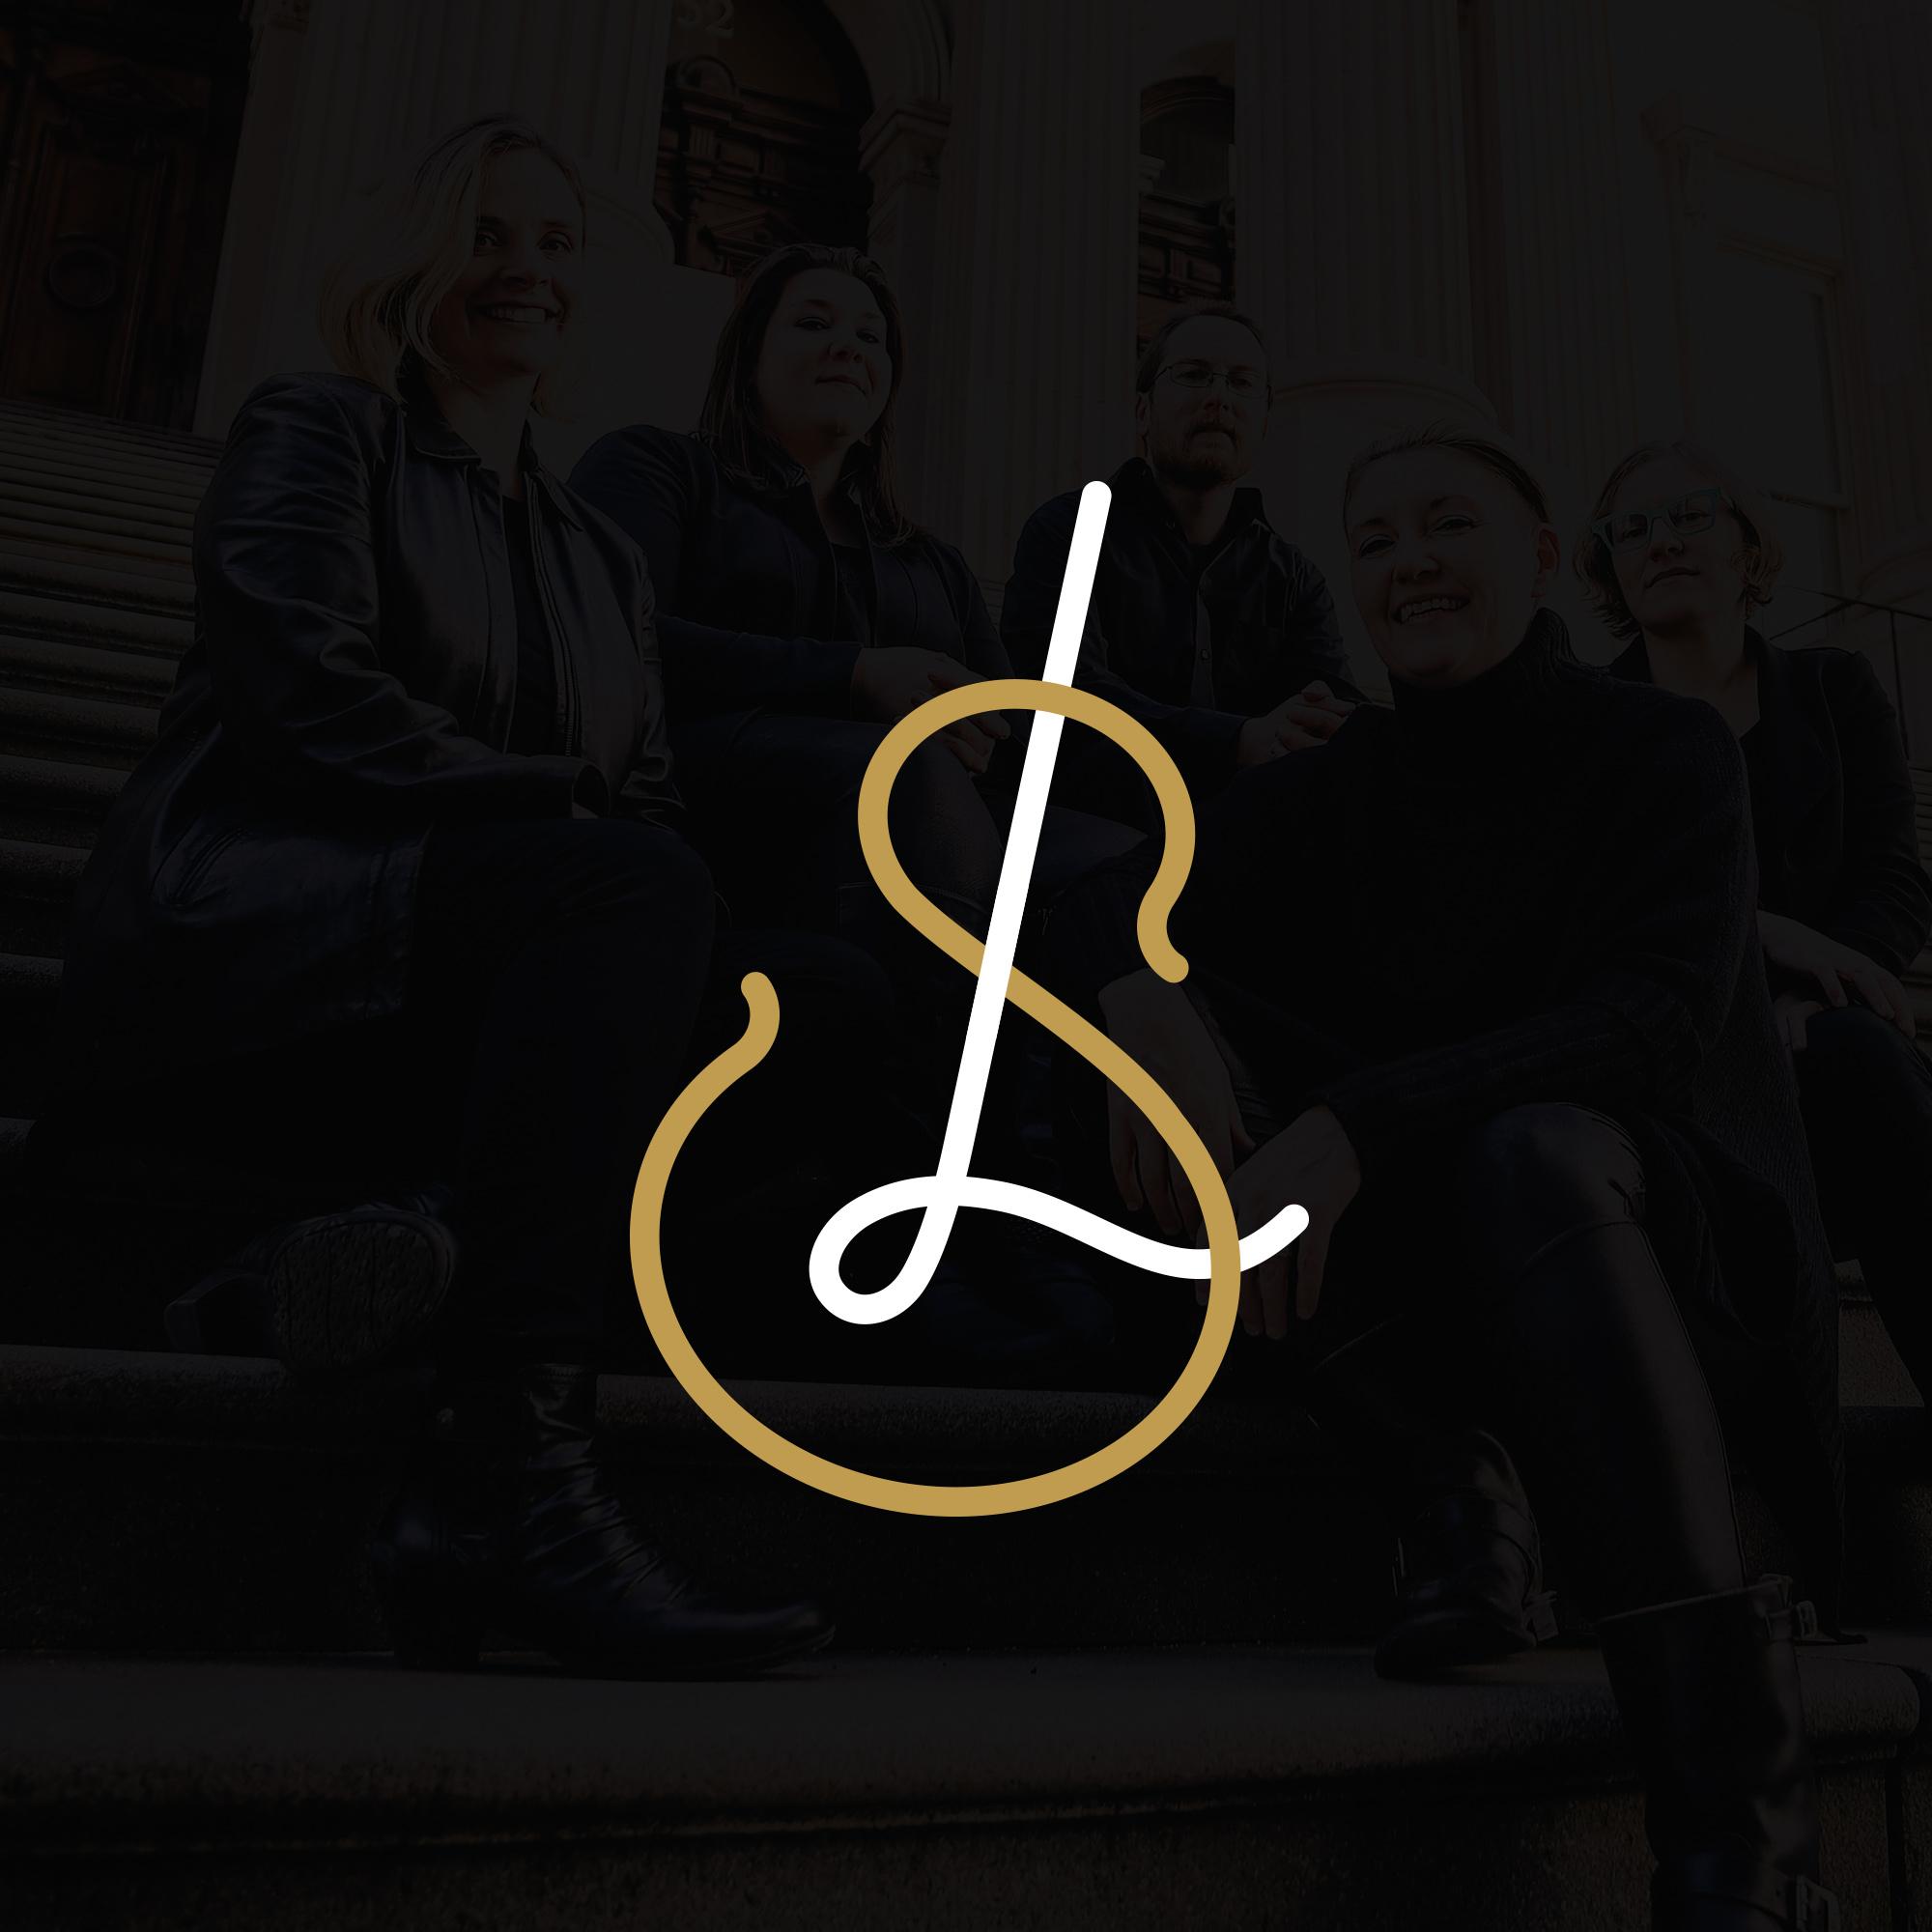 Dave Matthews Band - #41Crash Into MeYou And Me